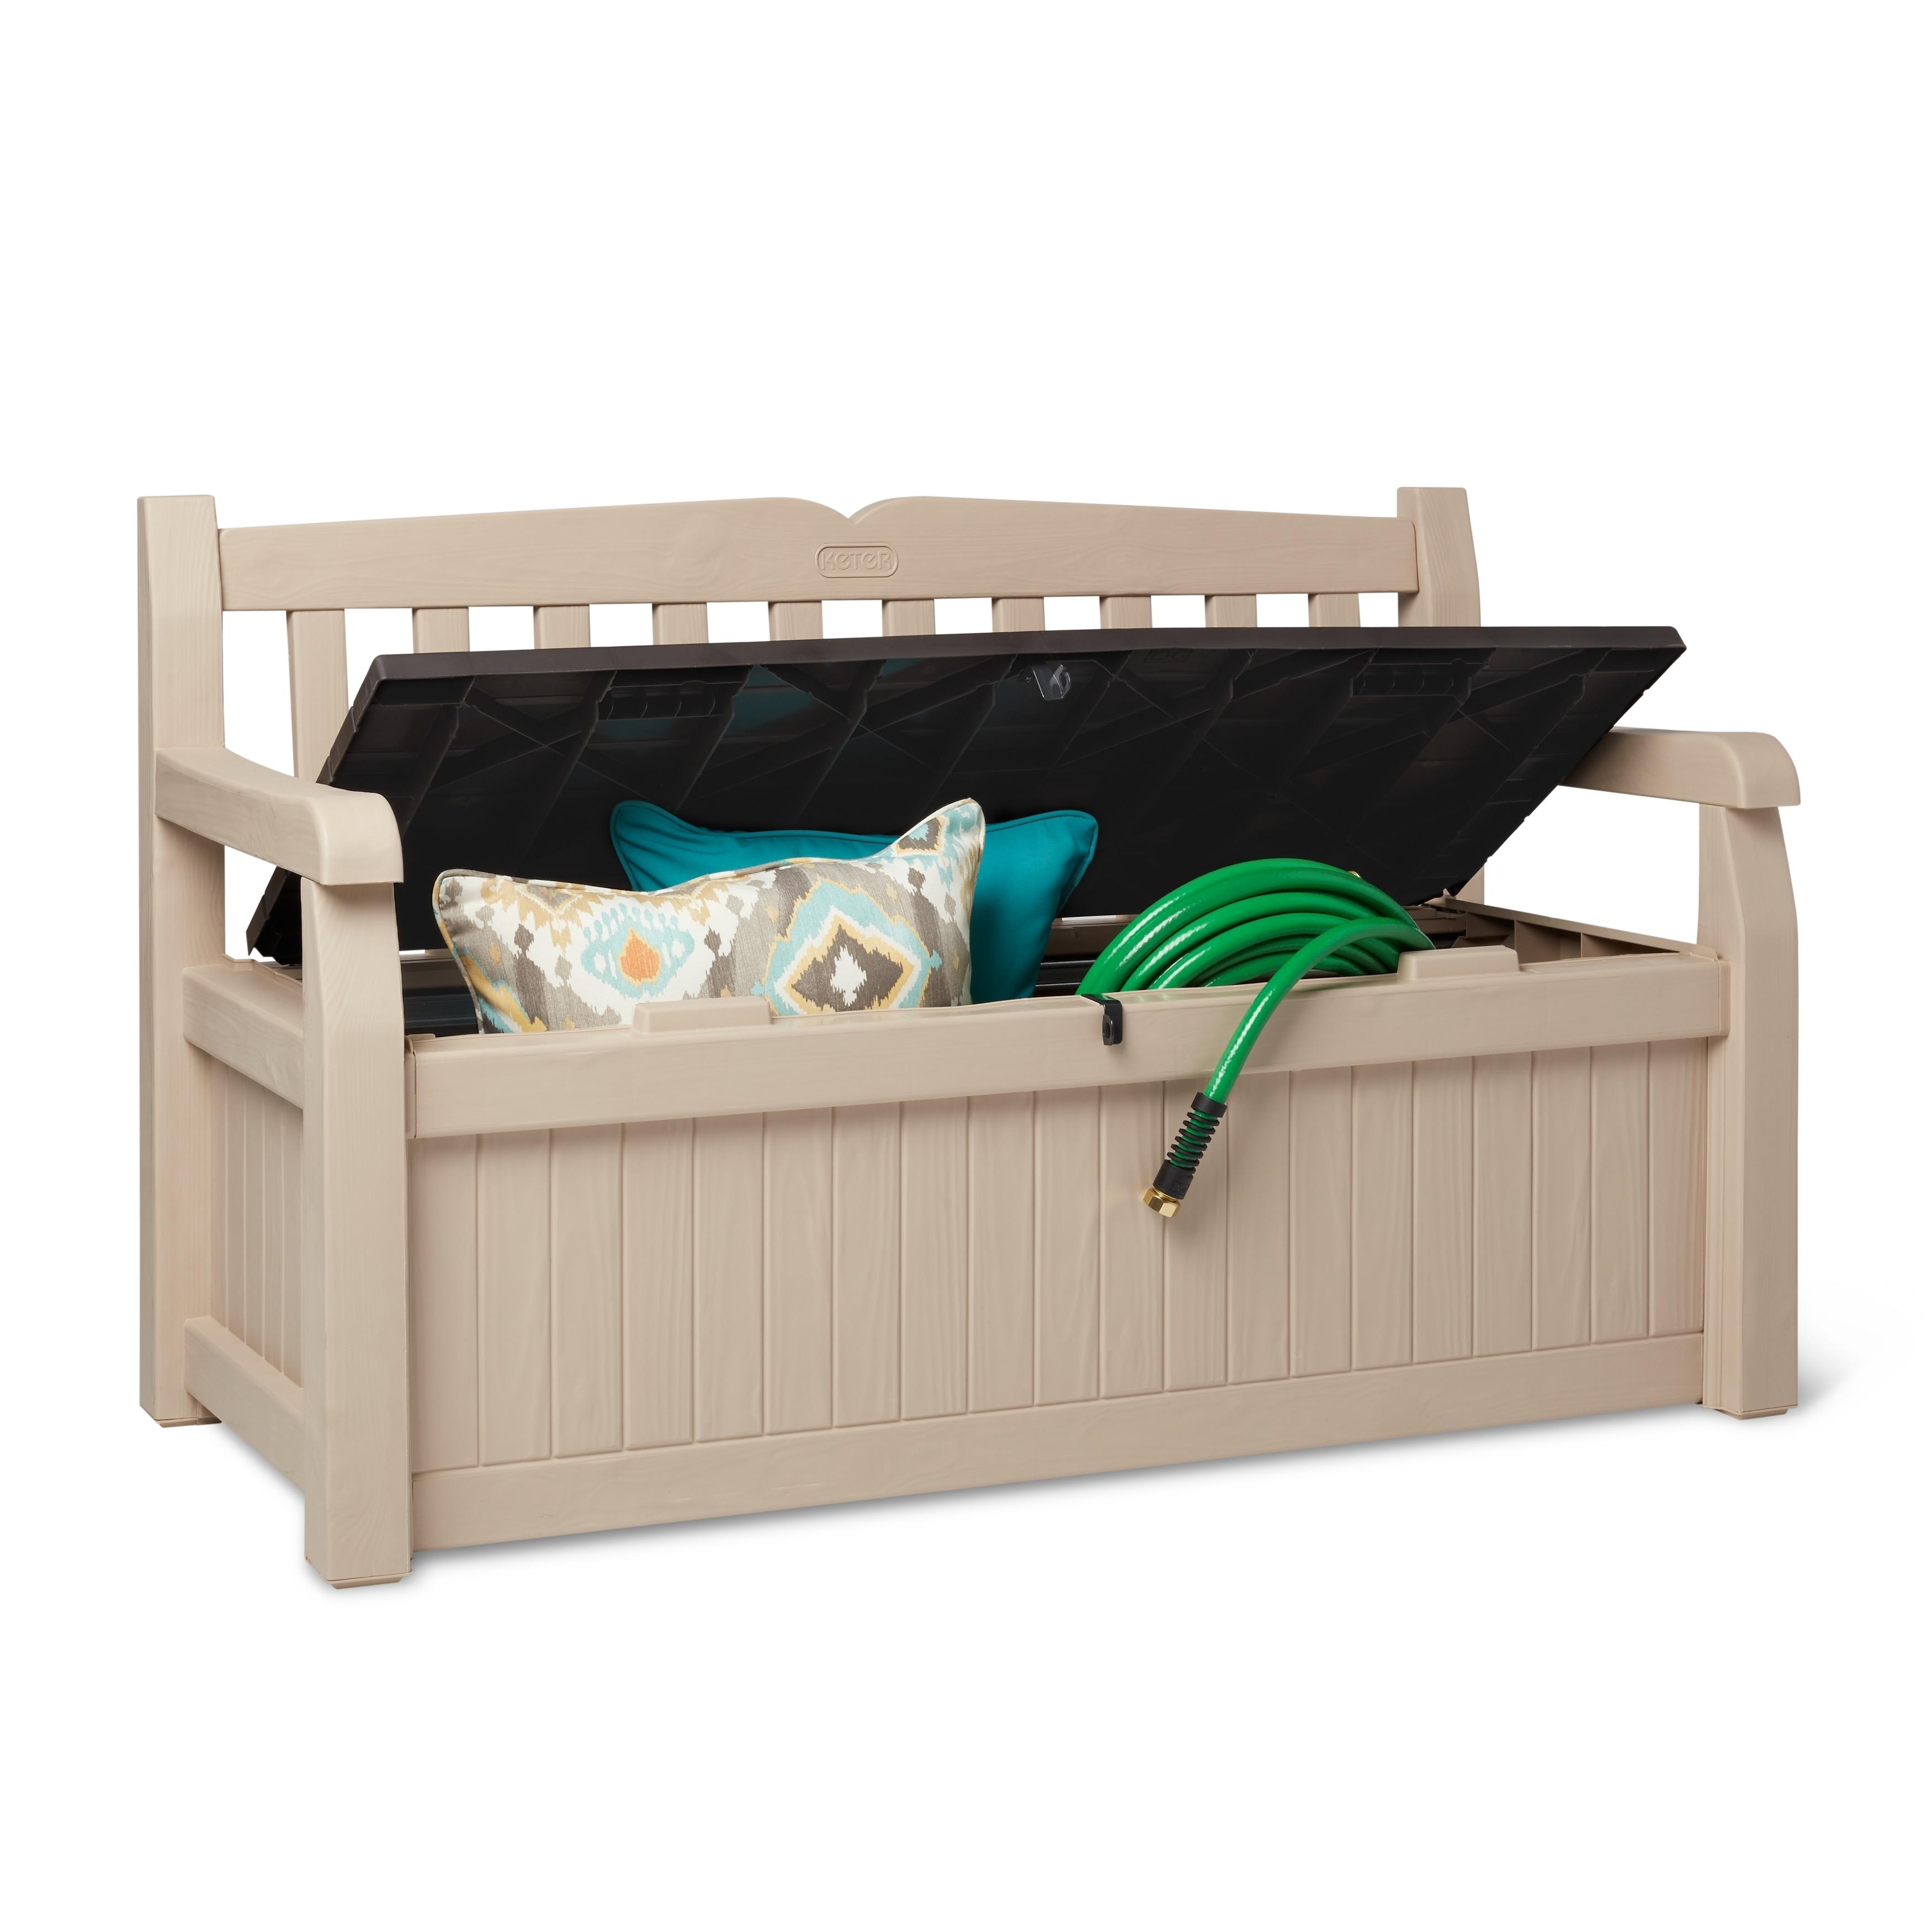 x w wood look cushion storage capacity h box plastic dp litre multistore bench l garden cm